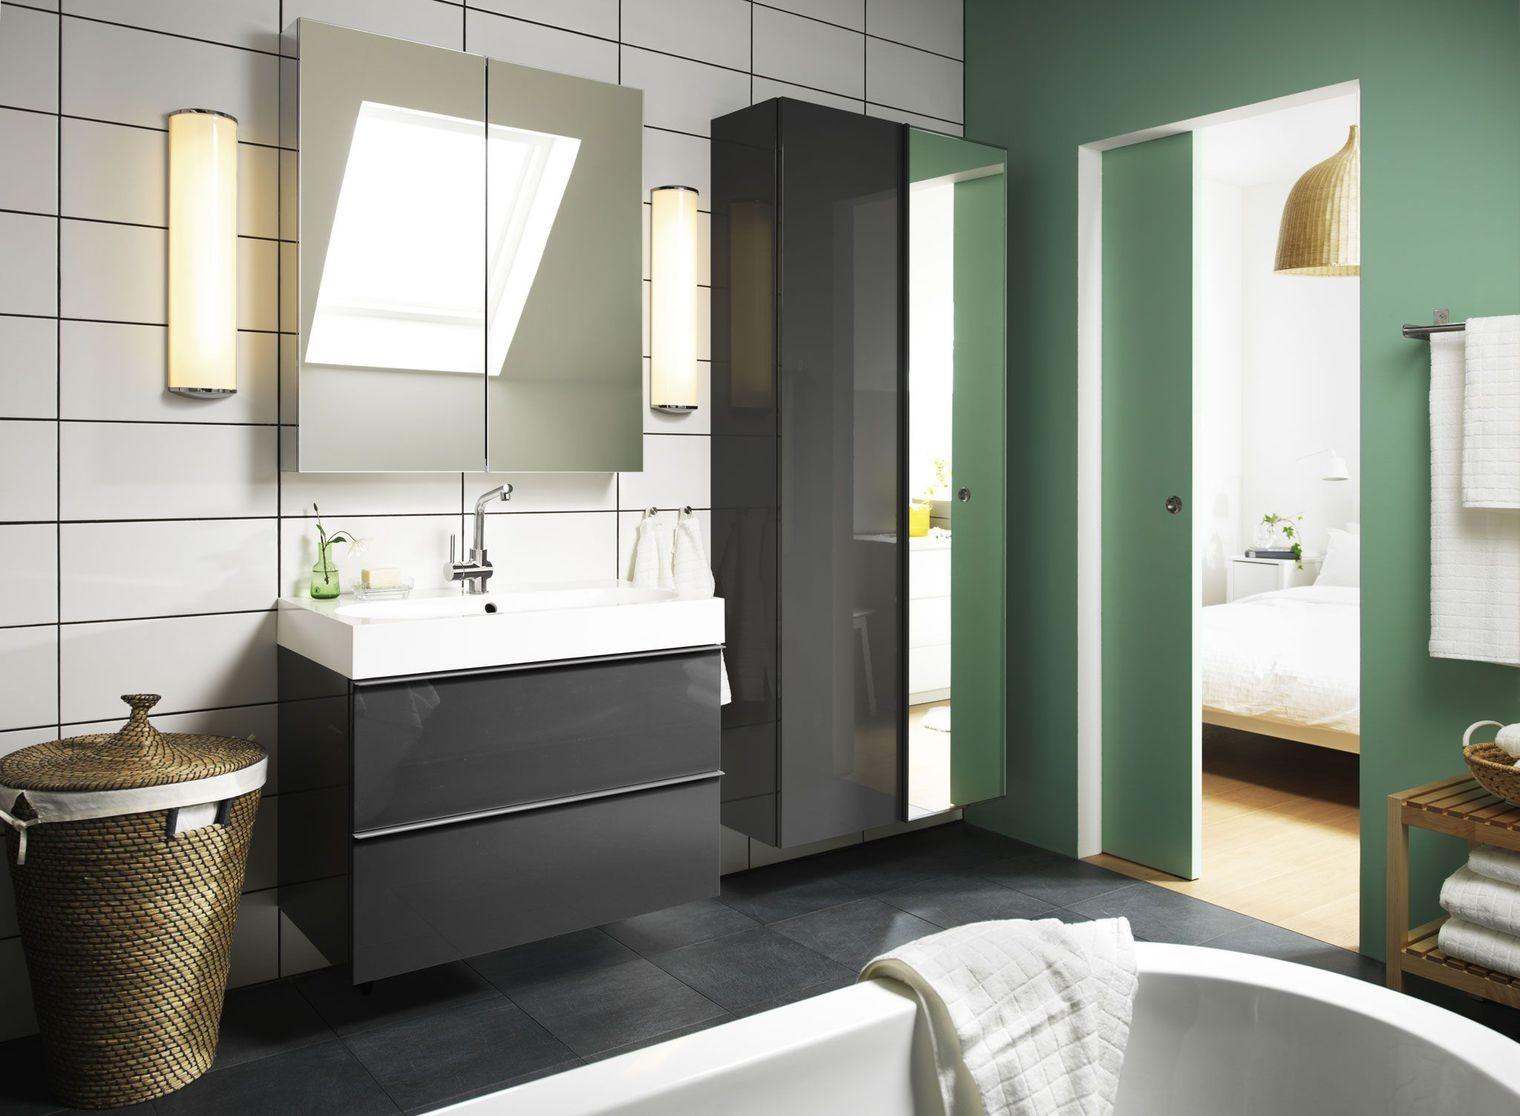 Armoire salle de bain ikea armoire id es de d coration for Ikea canada salle de bain